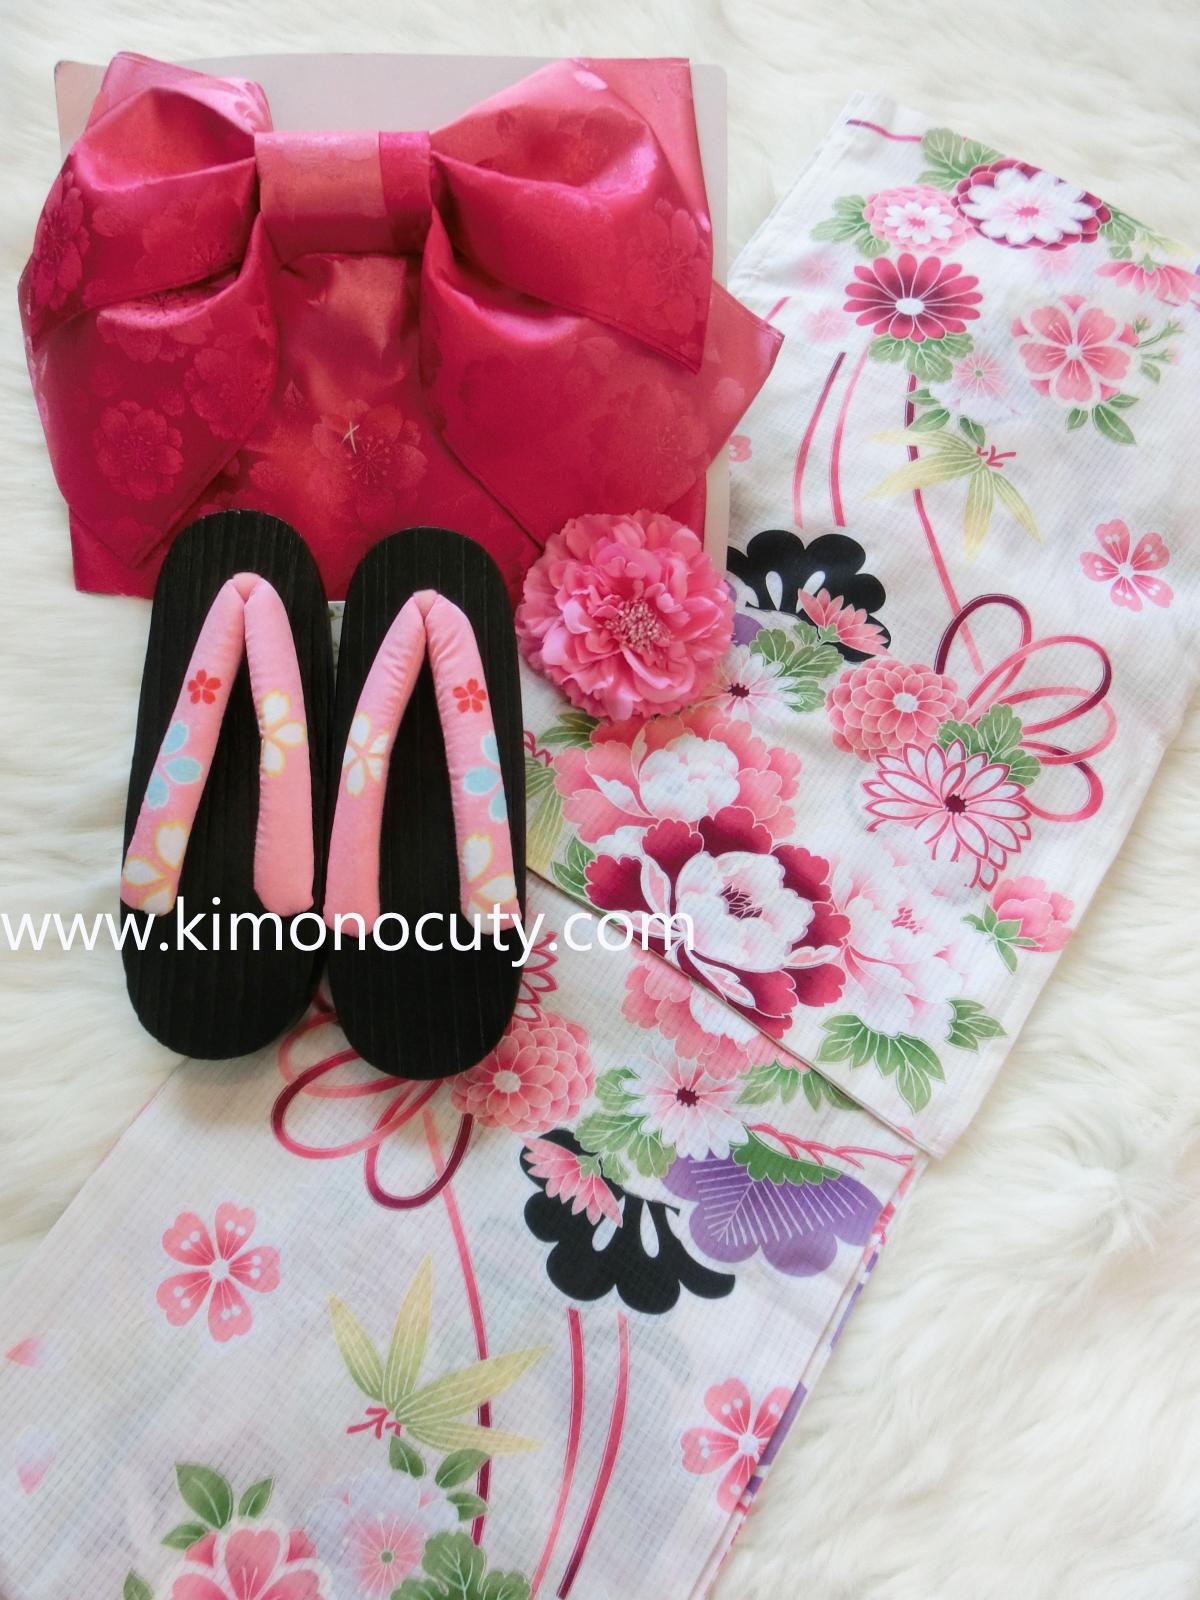 Summer kimono กิโมโนฤดูร้อน (Yukata) Spring Flower สีชมพู รุ่น 2 เซต 2 ชิ้น